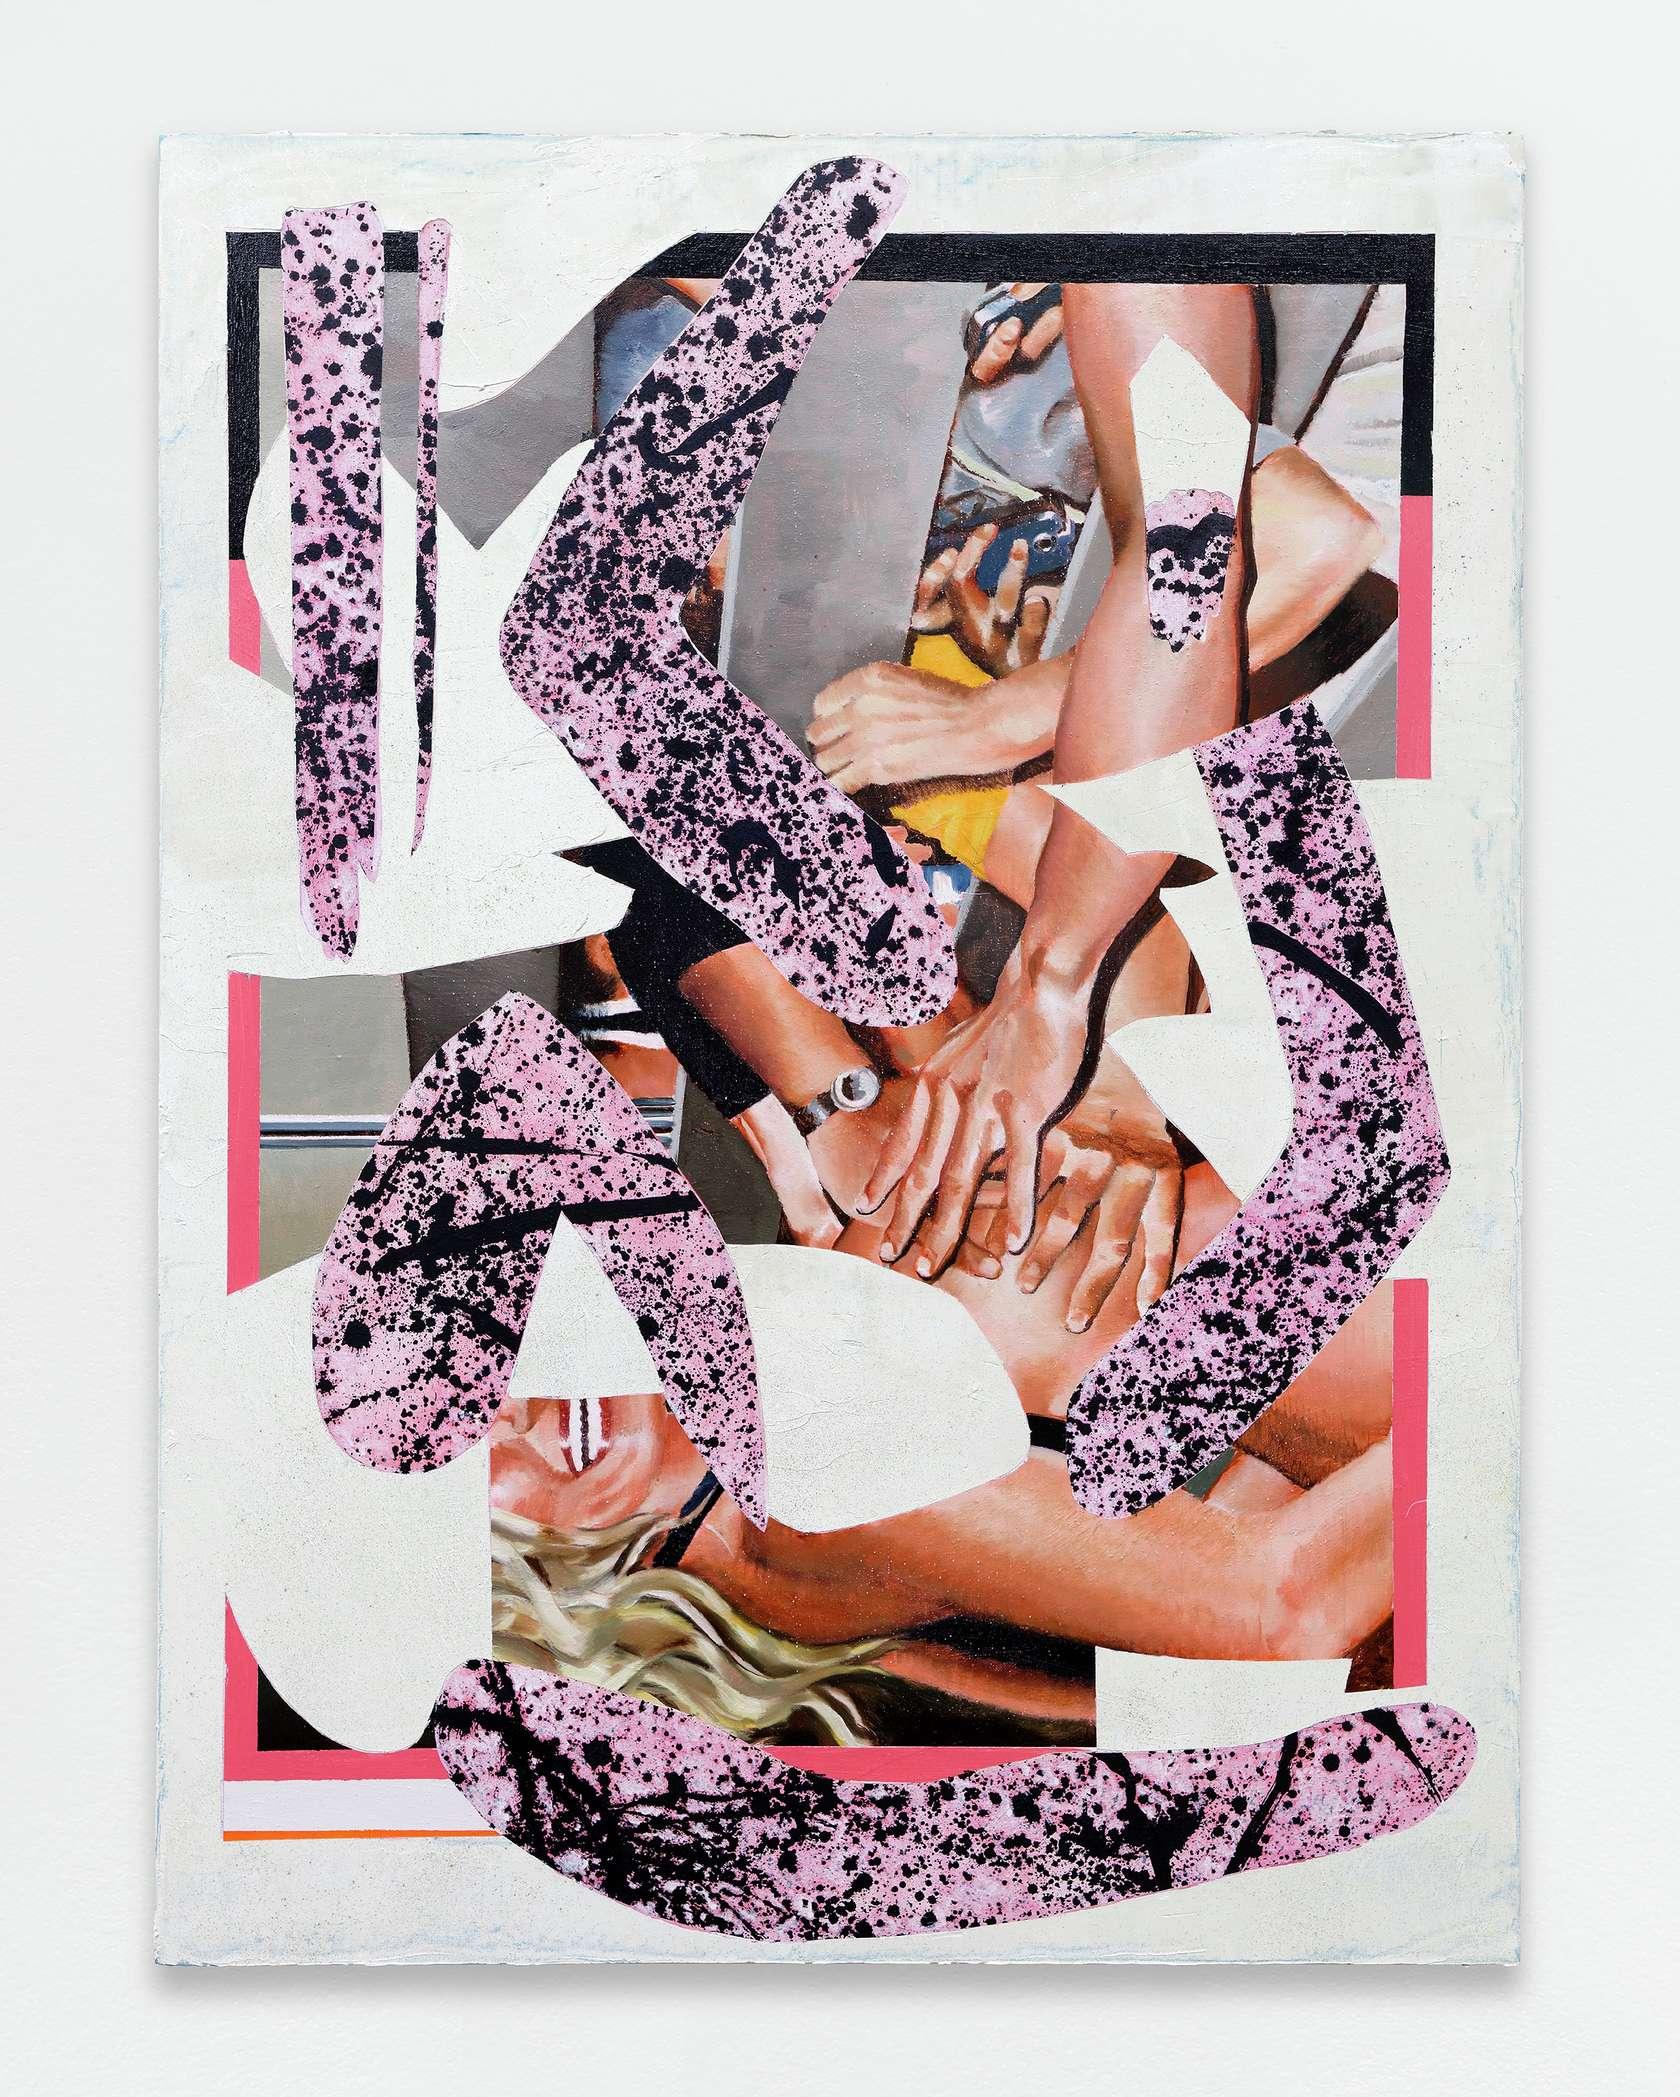 Laurent Proux, Pulp II, 2017 Huile sur toile130 × 97 cm / 51 1/8 × 38 2/8 in.